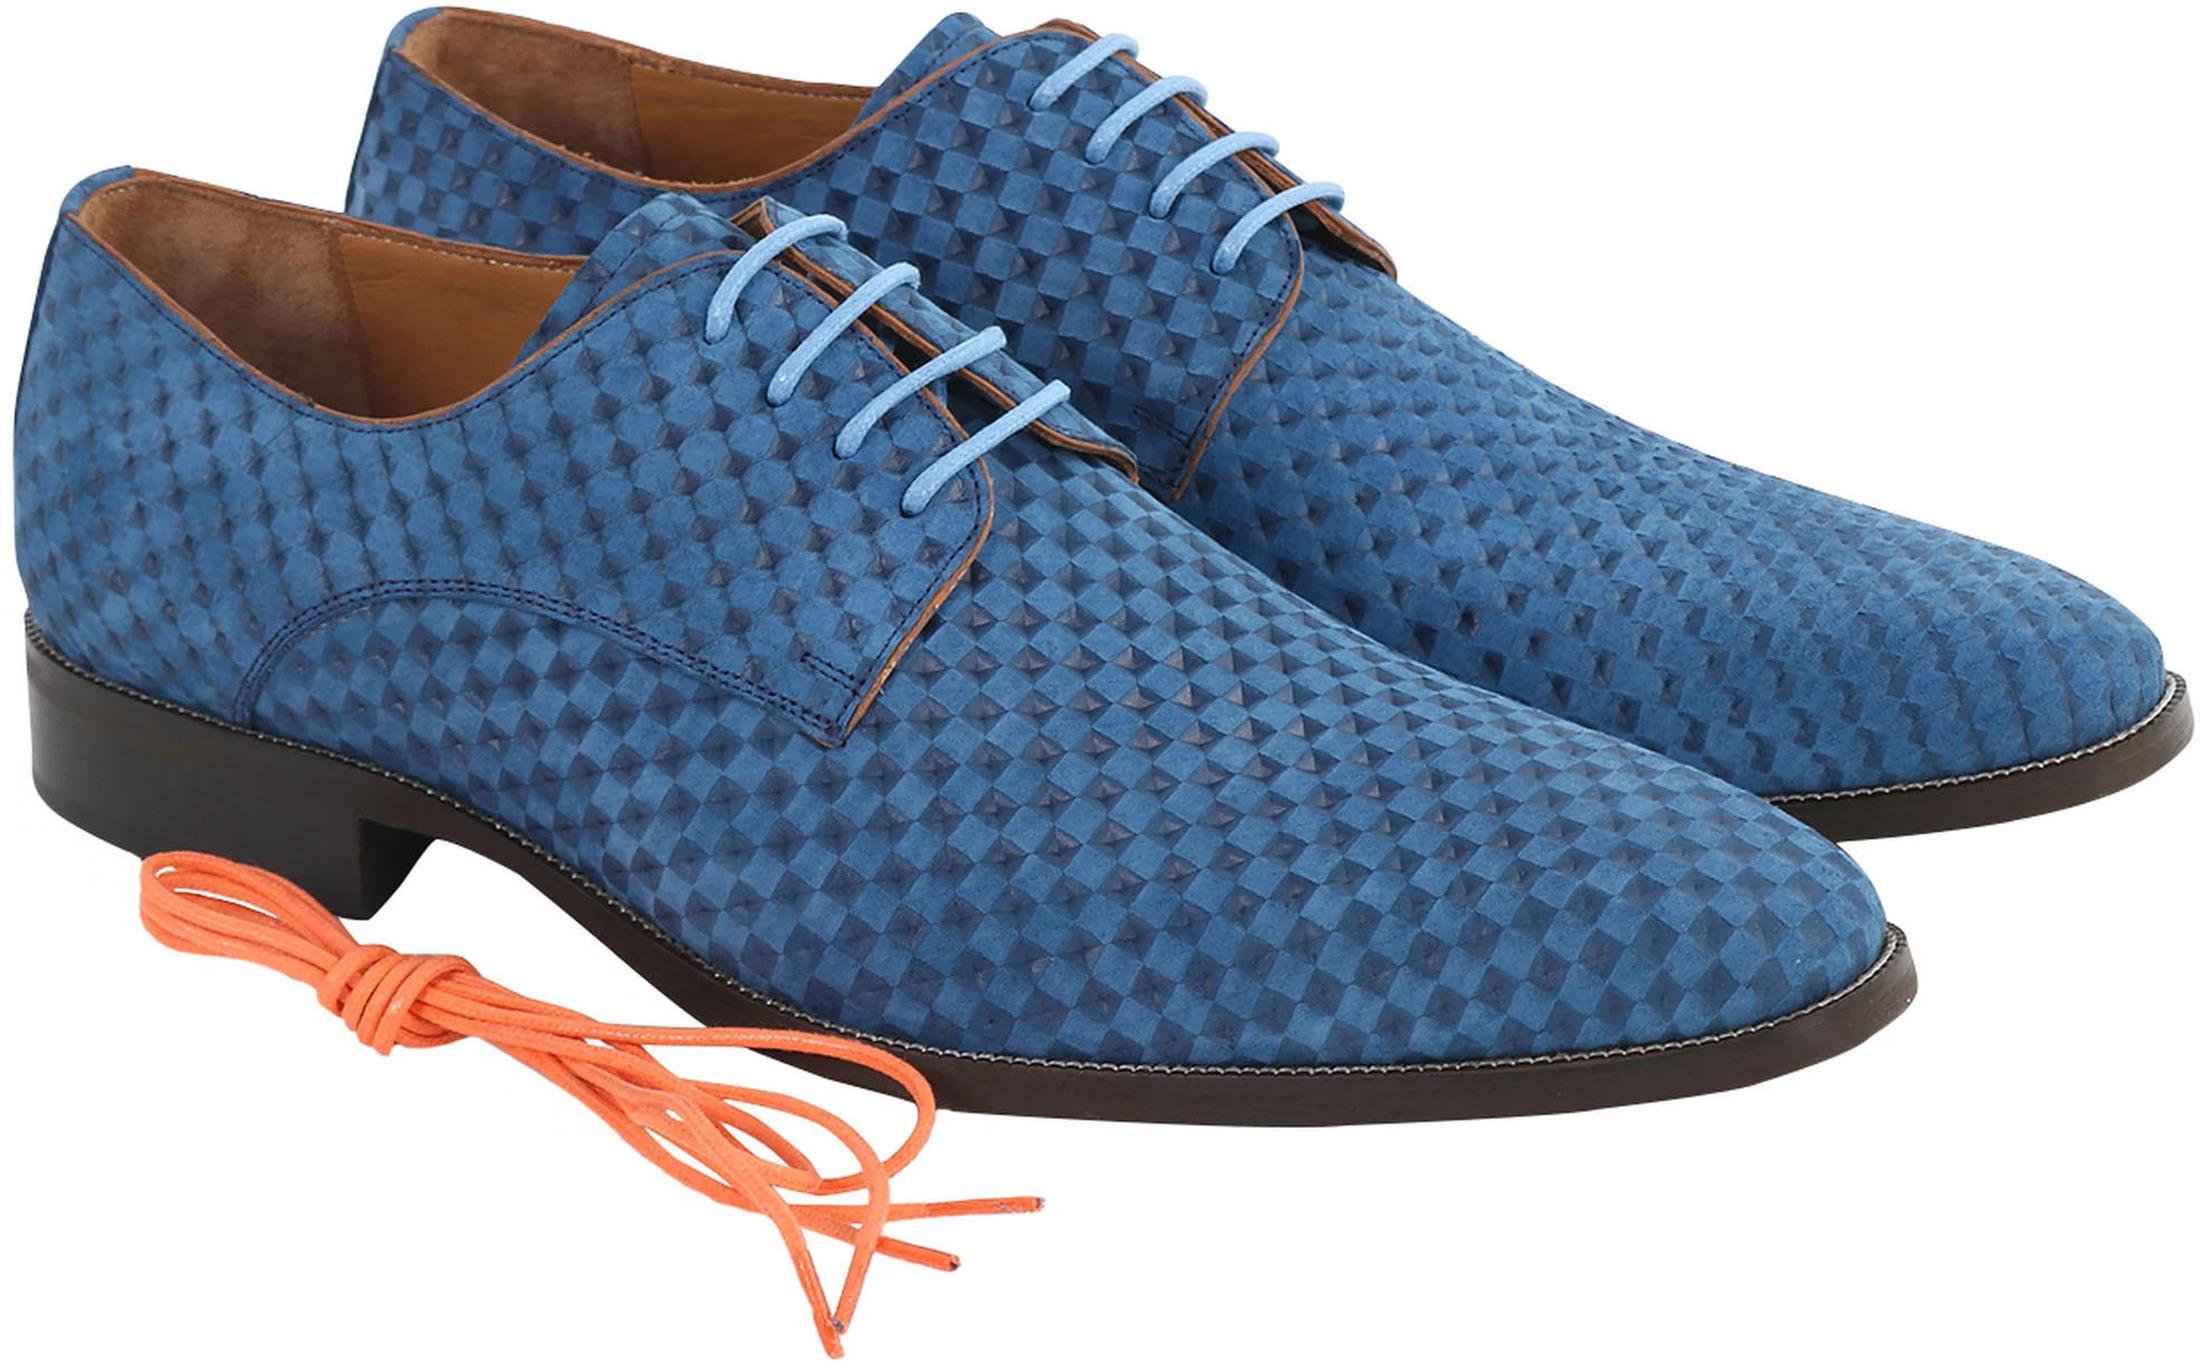 Leder Schuh Blau foto 0